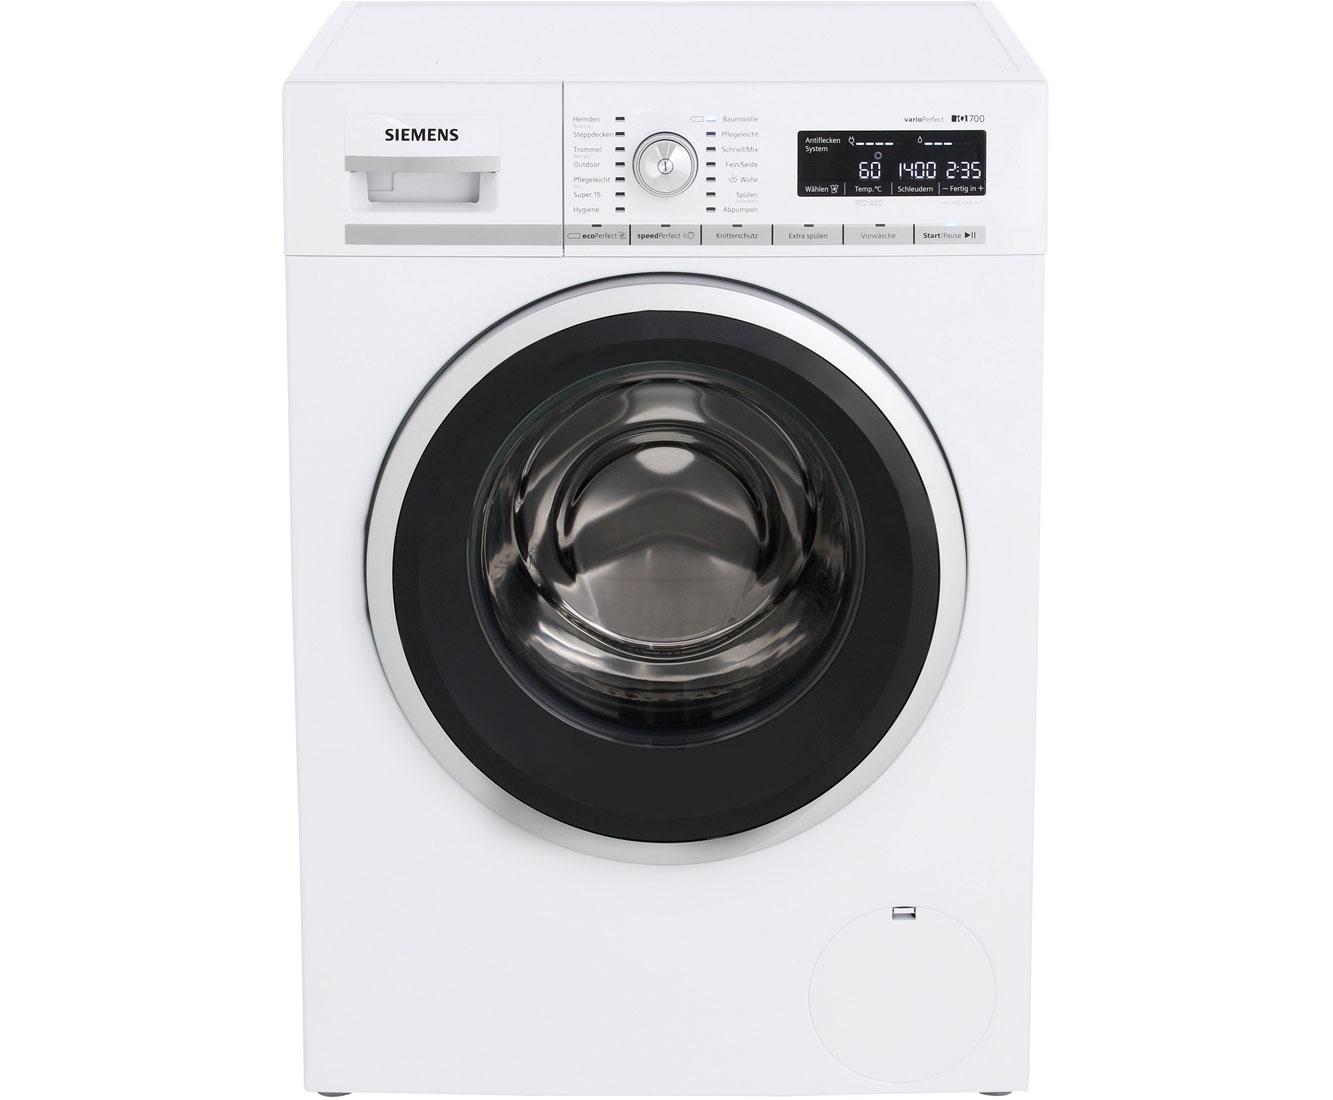 Siemens iq700 wm14w540 waschmaschine 8 kg 1400 u min a